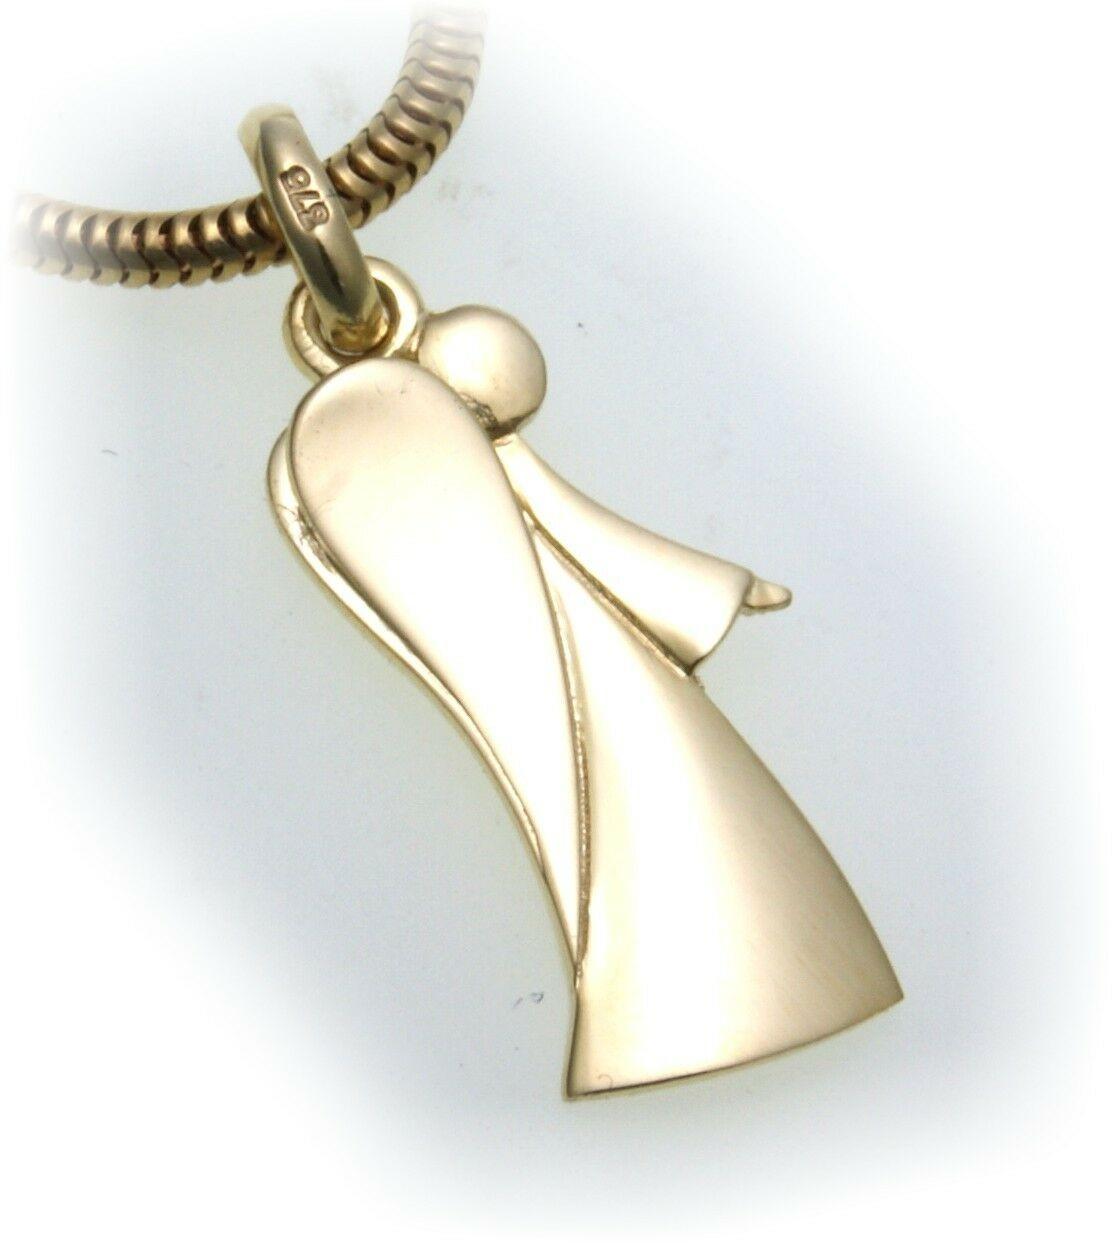 Anhänger Engel echt Gold 375 Glanz 9kt Schutzengel Qualität Gelbgold Damen